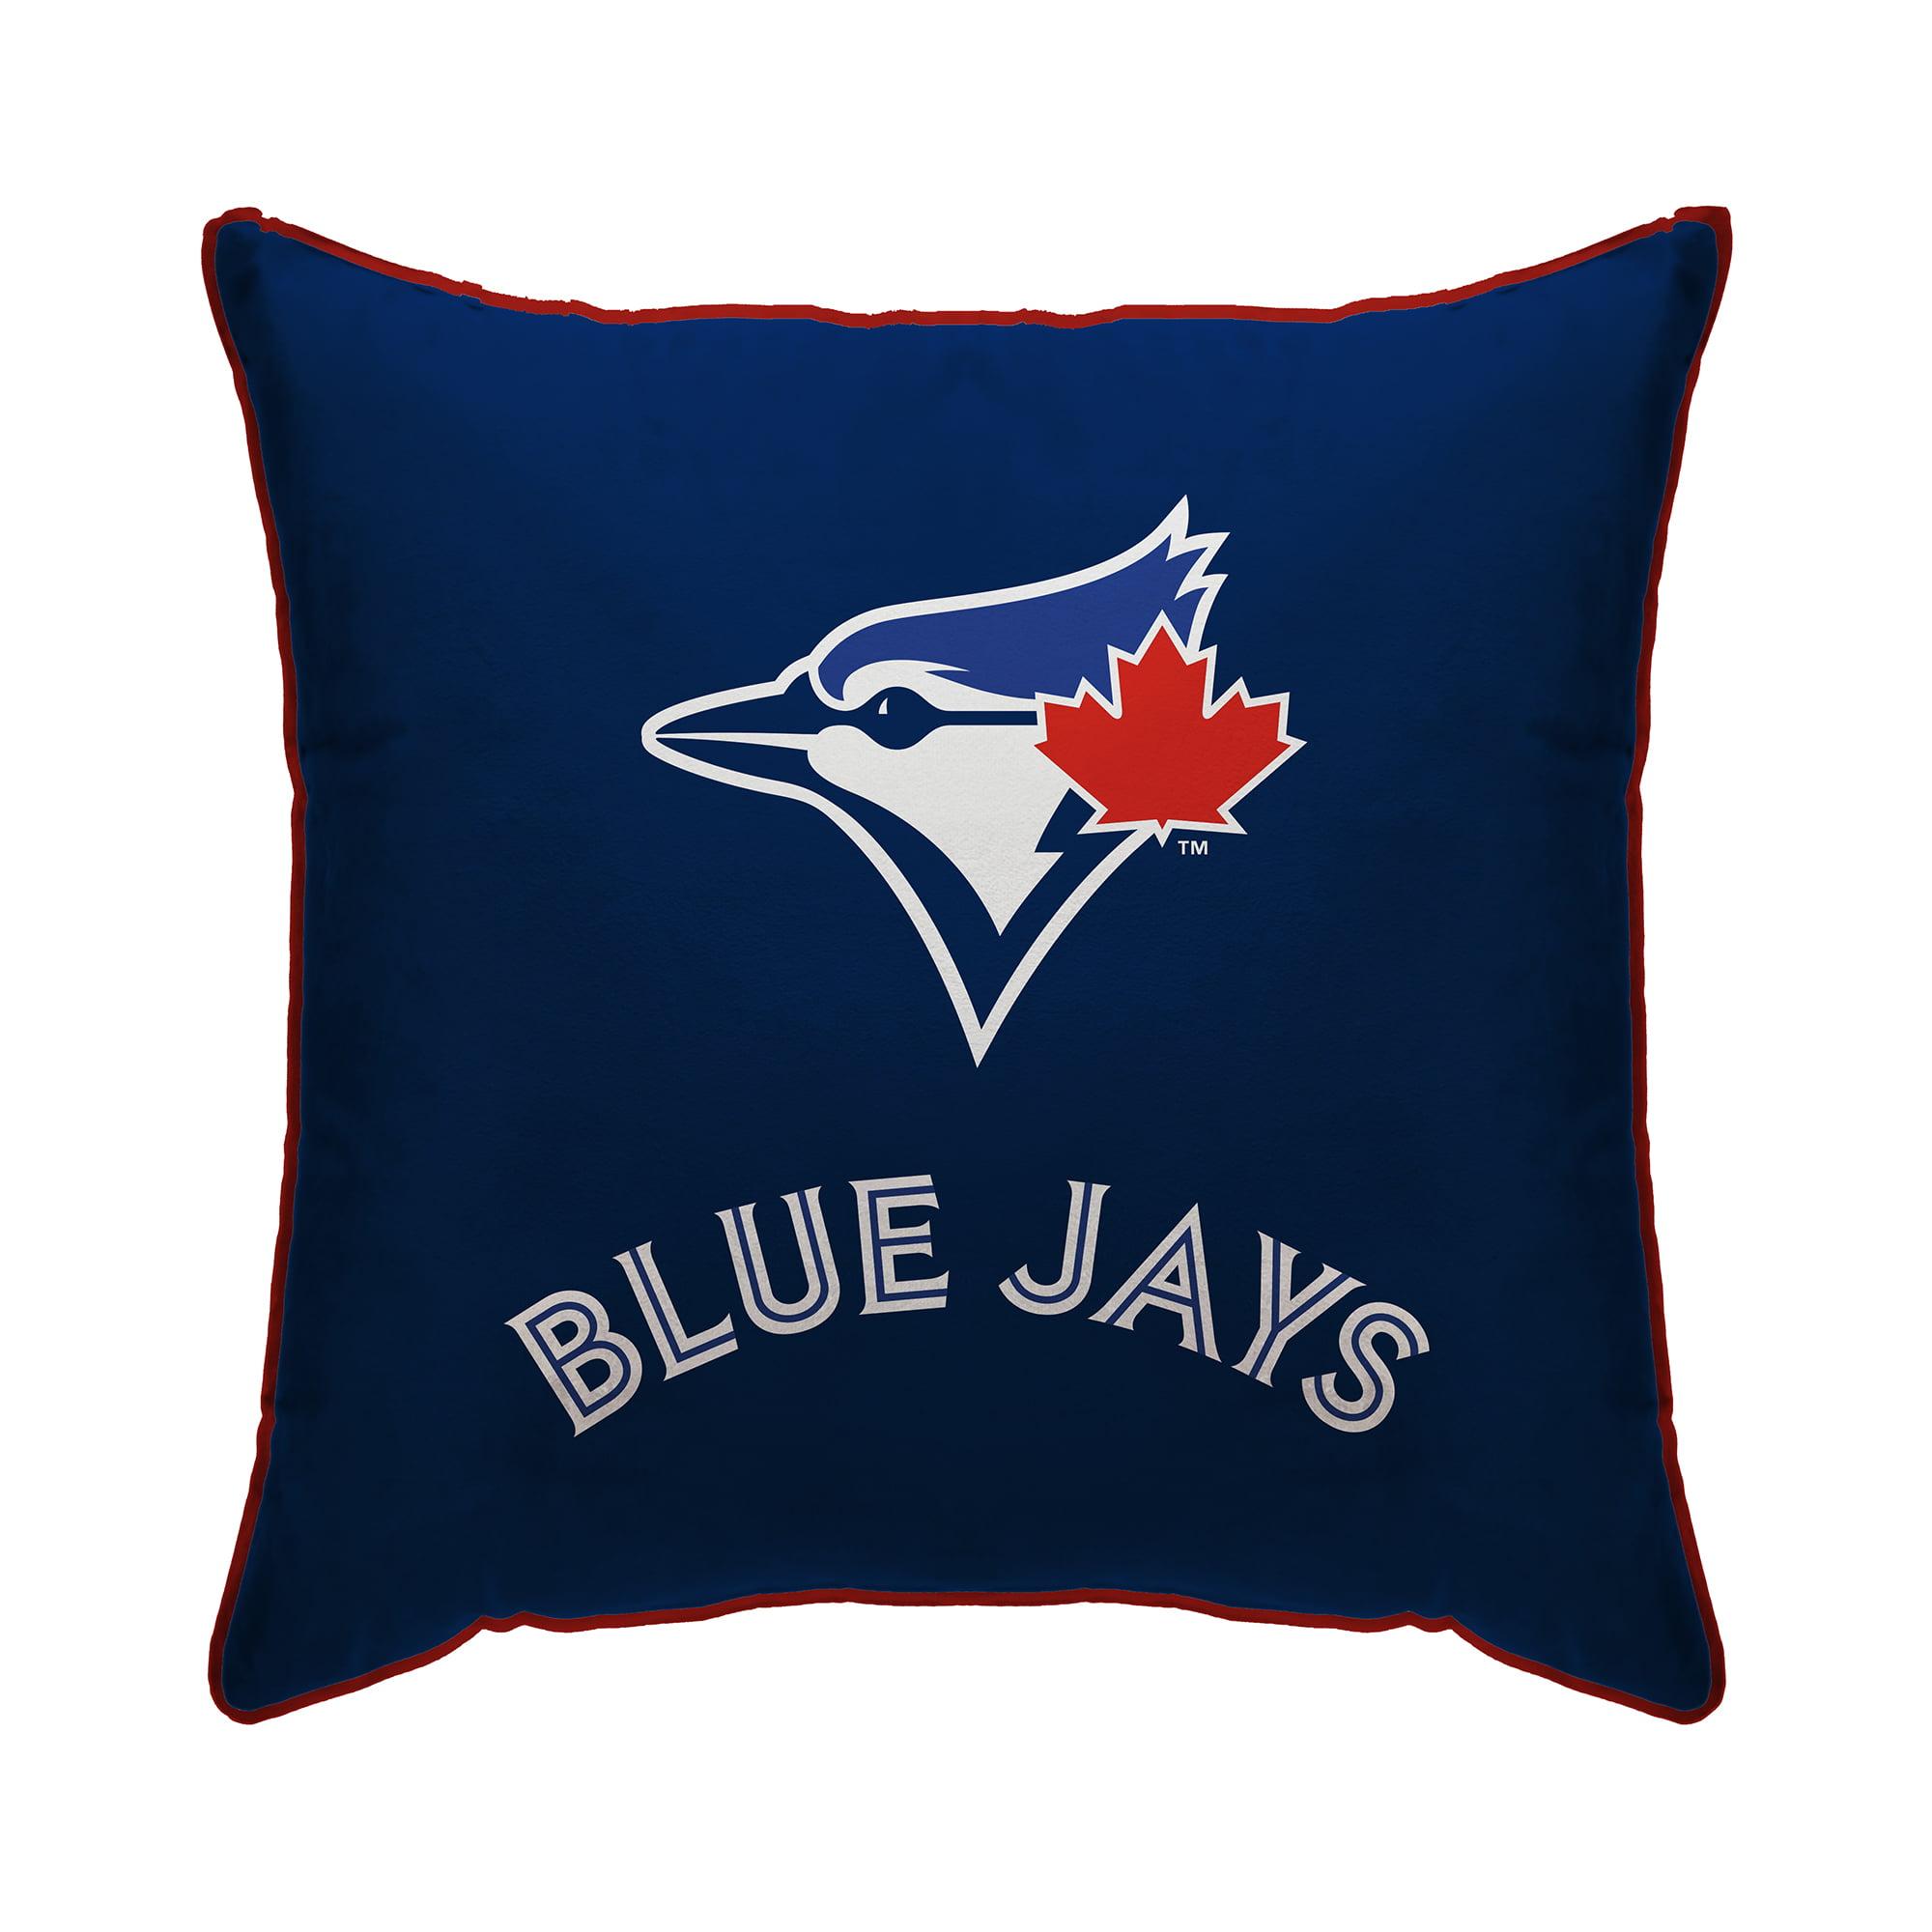 "Toronto Blue Jays 18"" x 18"" Plush Team Logo Decorative Throw Pillow - Blue - No Size"